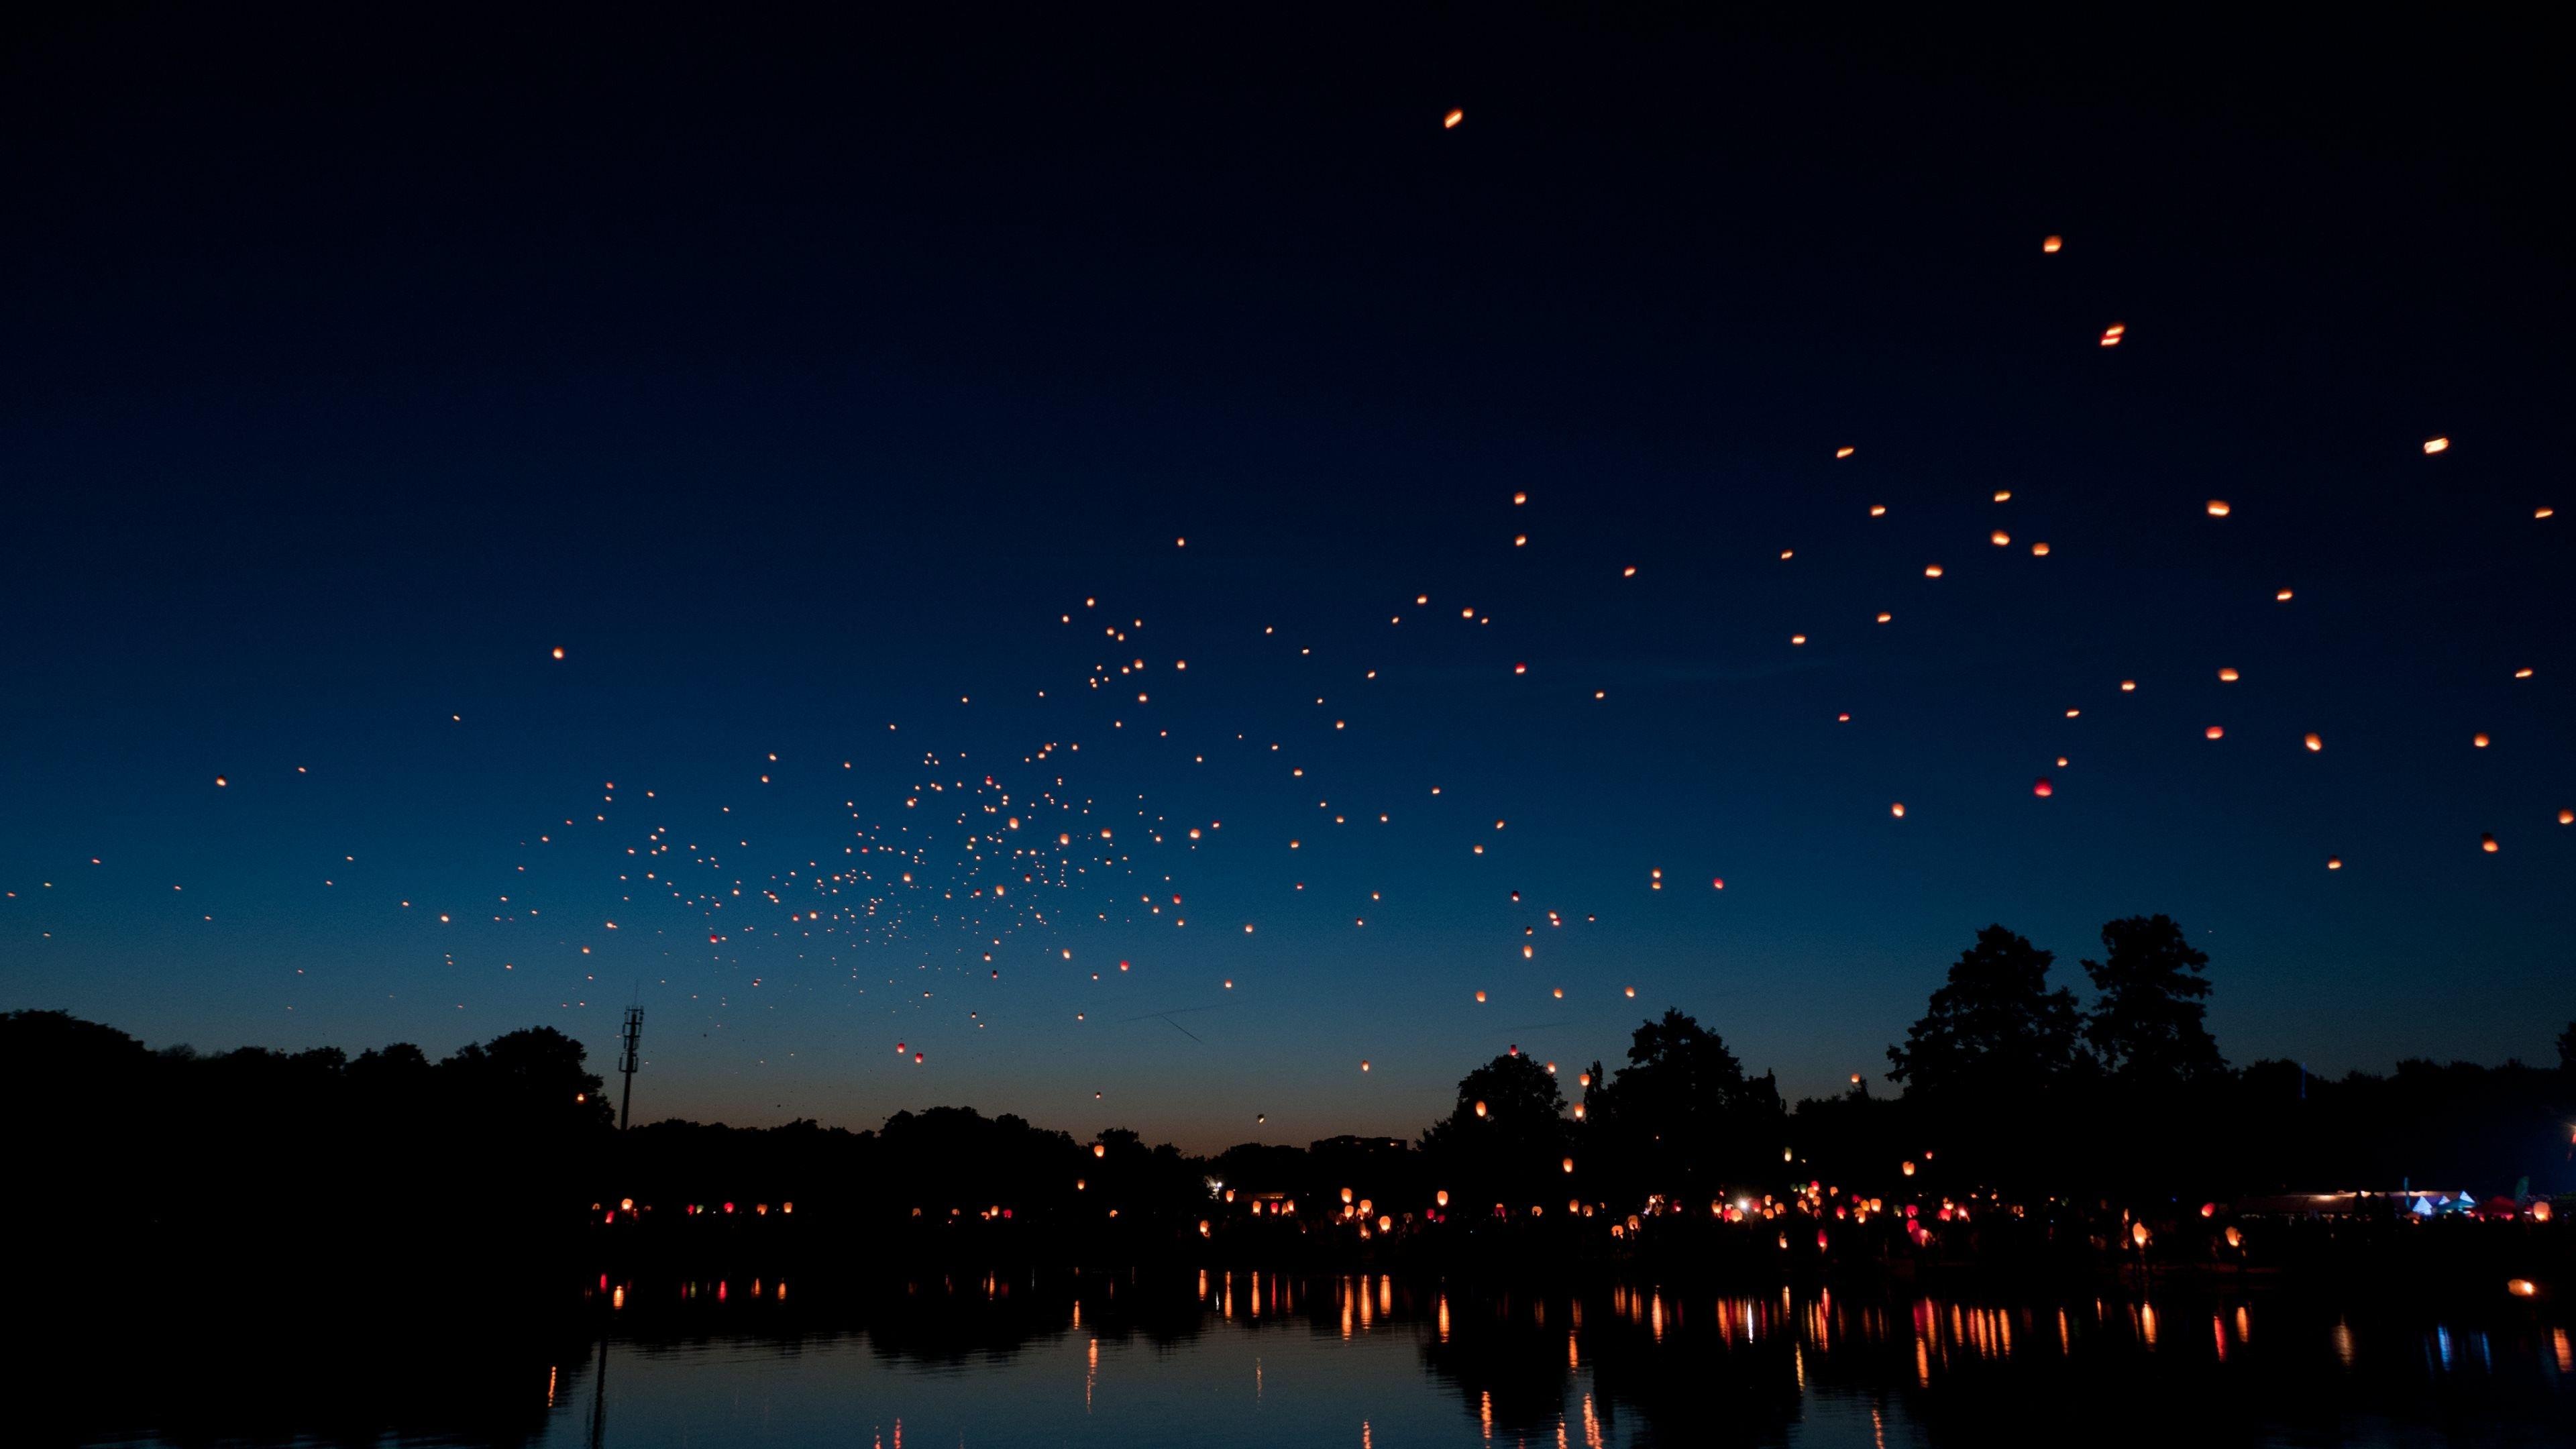 Hd wallpaper ultra - Flying Hot Air Lanterns Ultra Wallpaper Jpg 3840